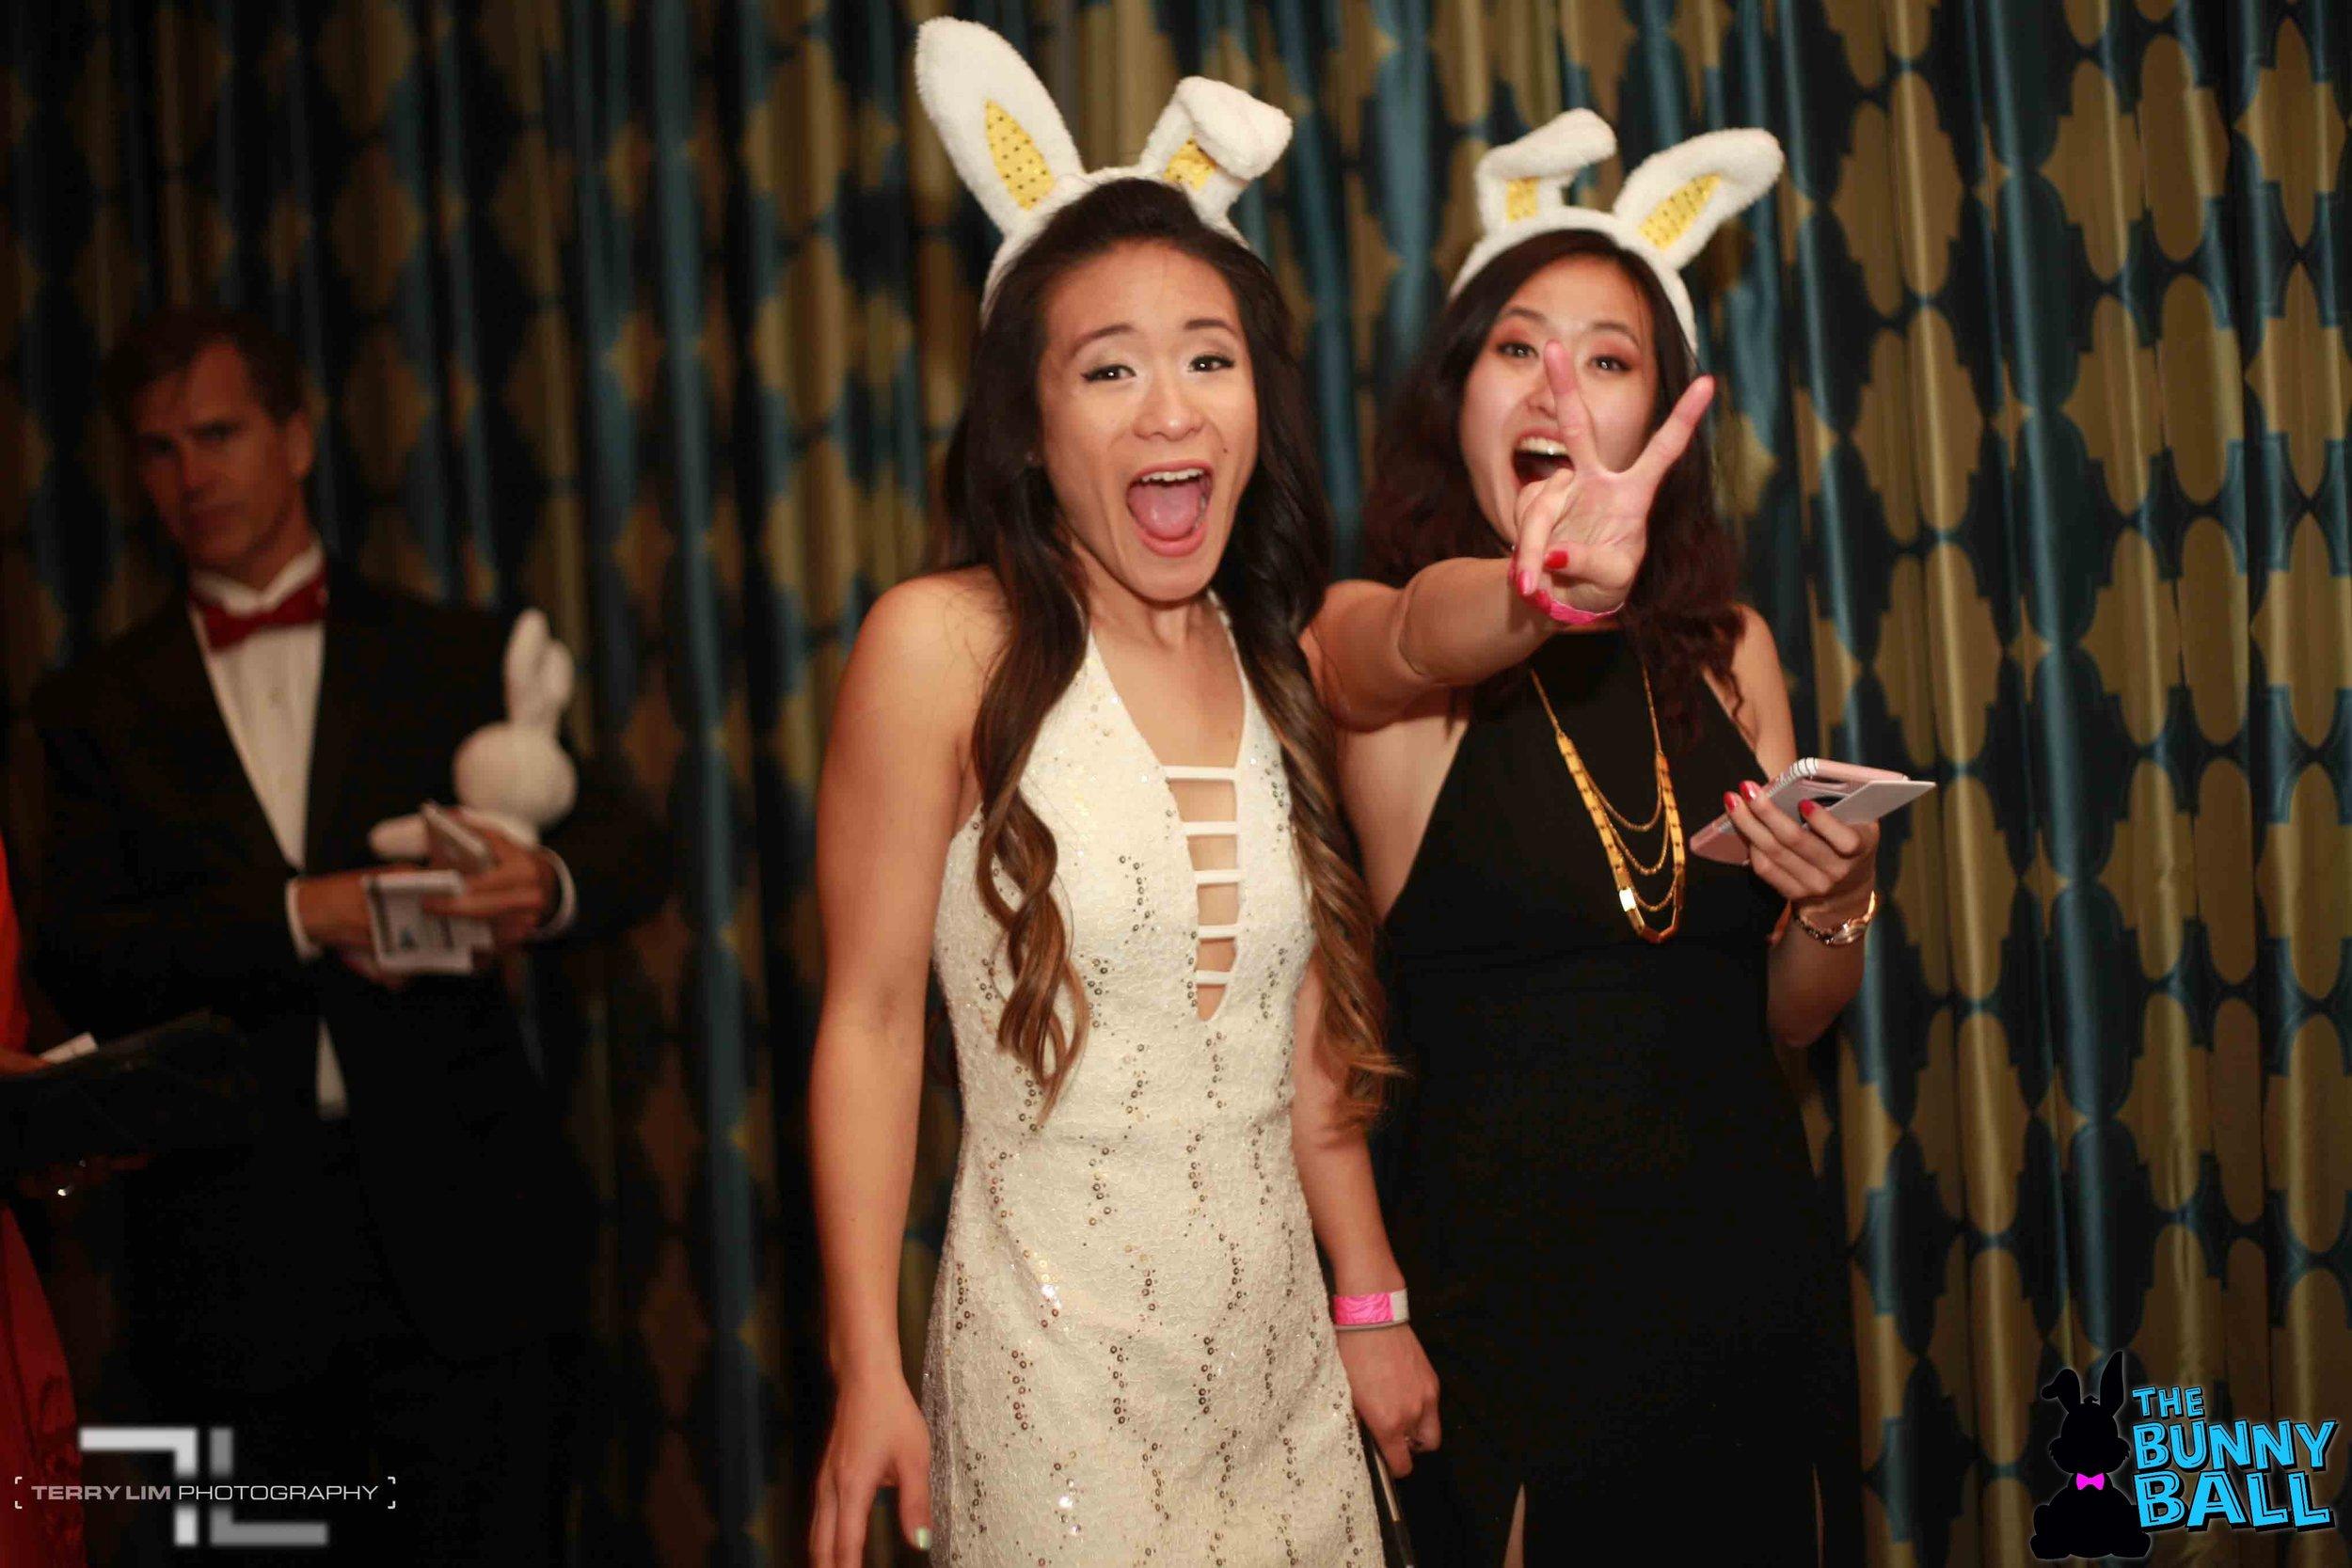 Terry_Lim_Photography_Bunny_Ball_2017 - 41.jpg